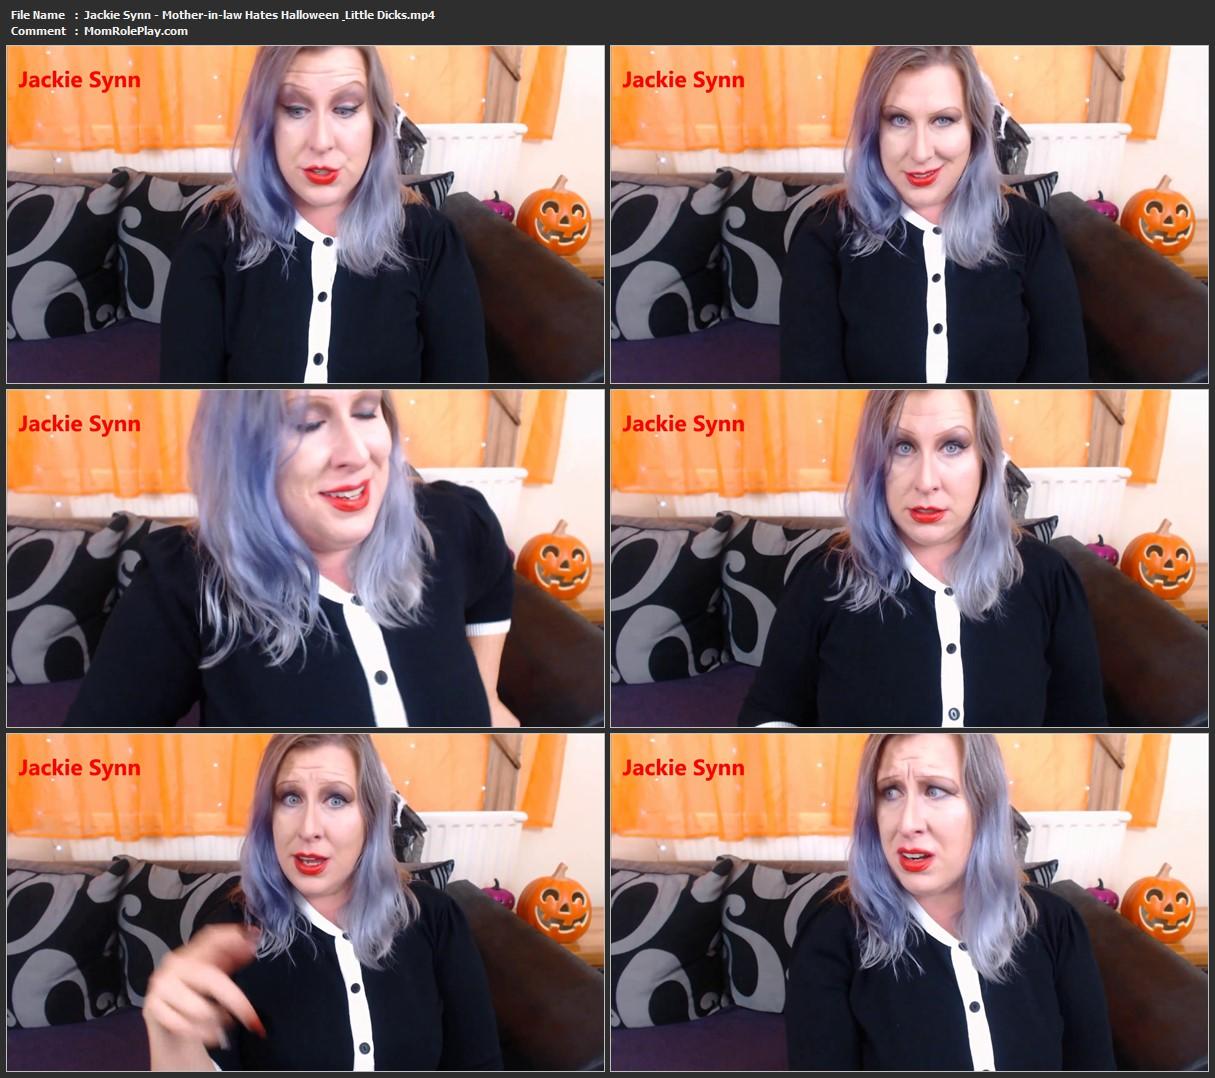 Jackie Synn - Mother-in-law Hates Halloween & Little Dicks